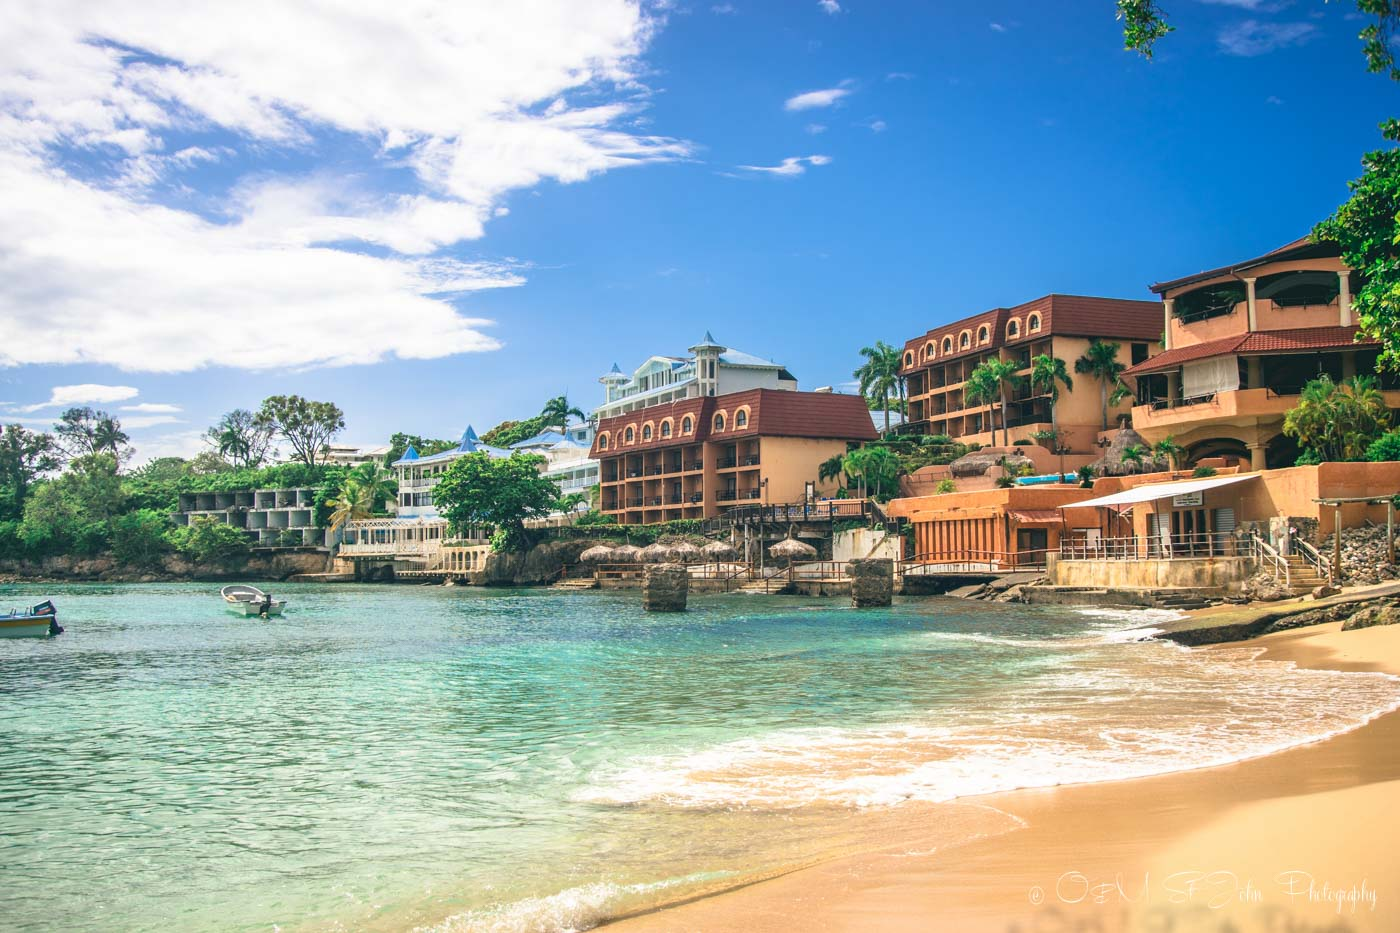 Sosua, a small beach town an hour away from Puerto Plata. Dominican Republic